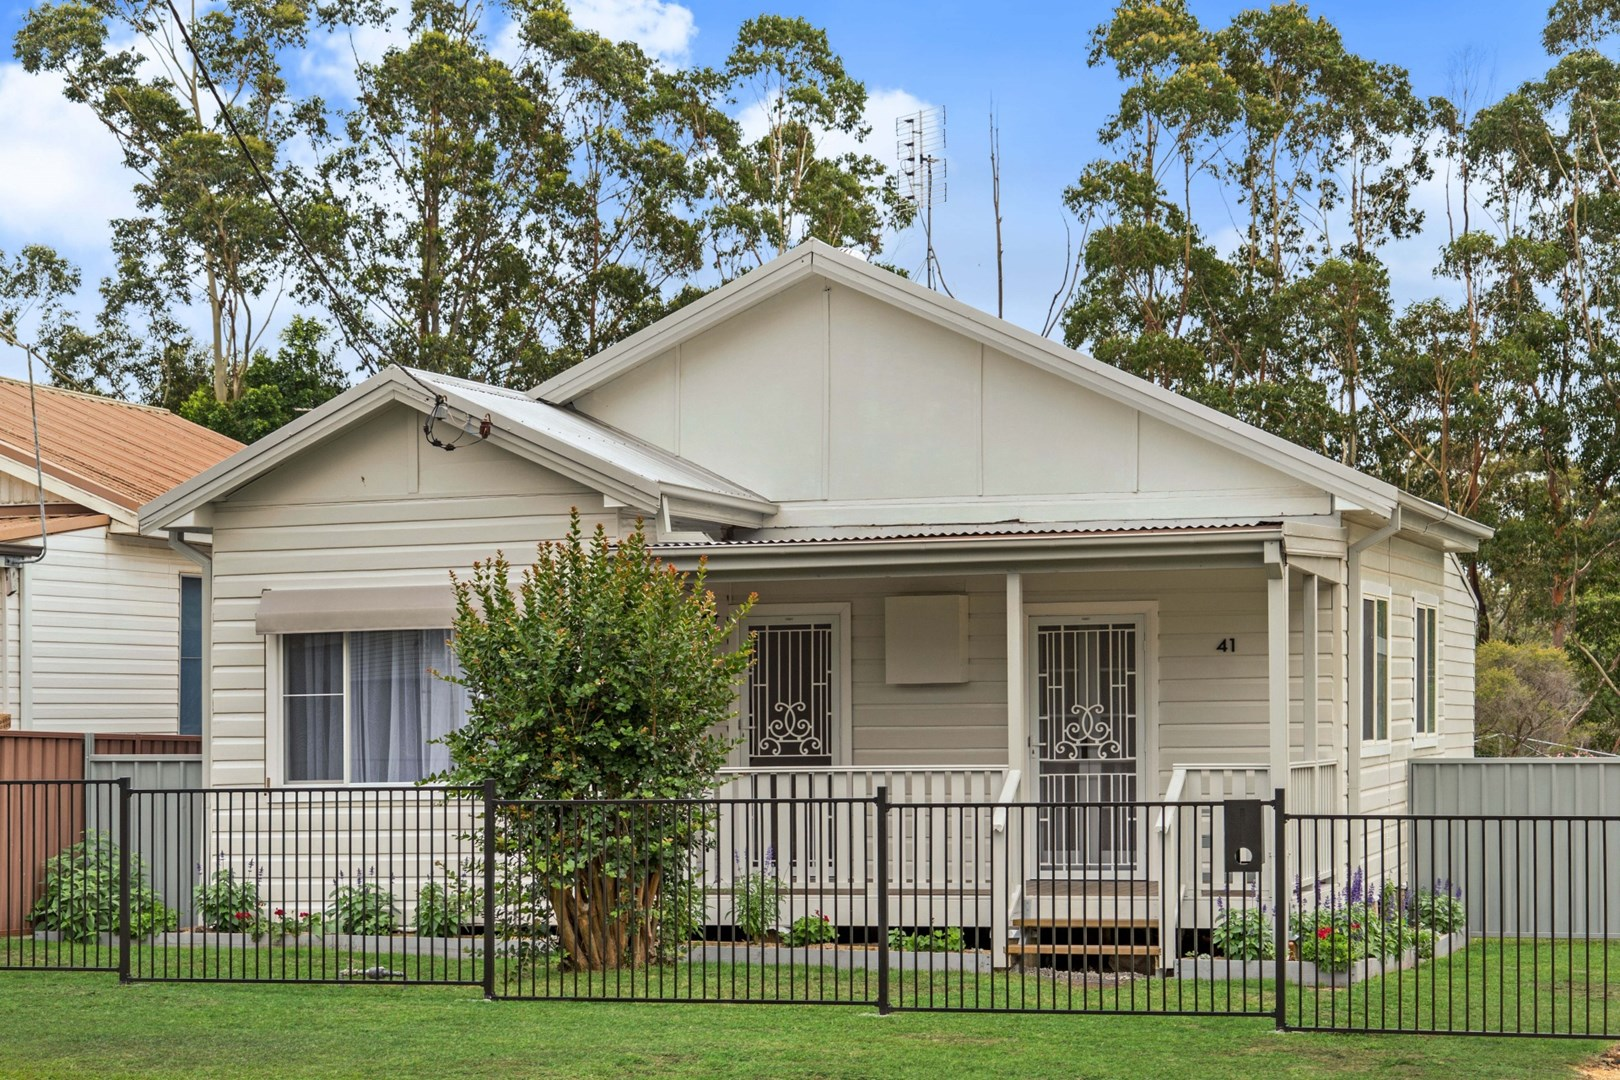 41 Addison Street, Beresfield NSW 2322, Image 0